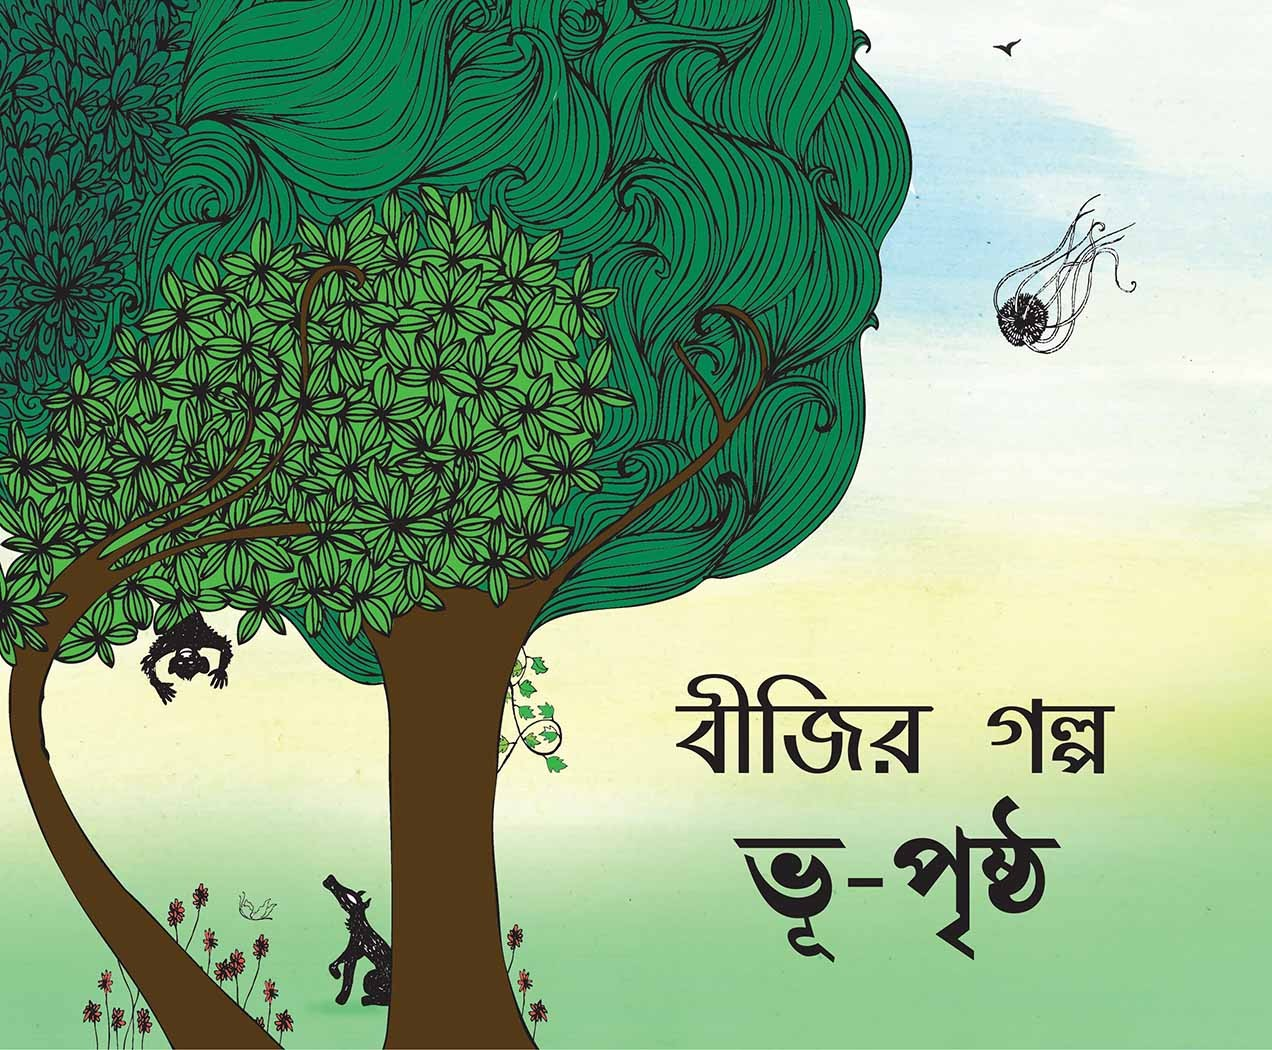 Beeji's Story-Earth's Surface/Beejir Golpo-Bhu-Prishtho (Bengali)